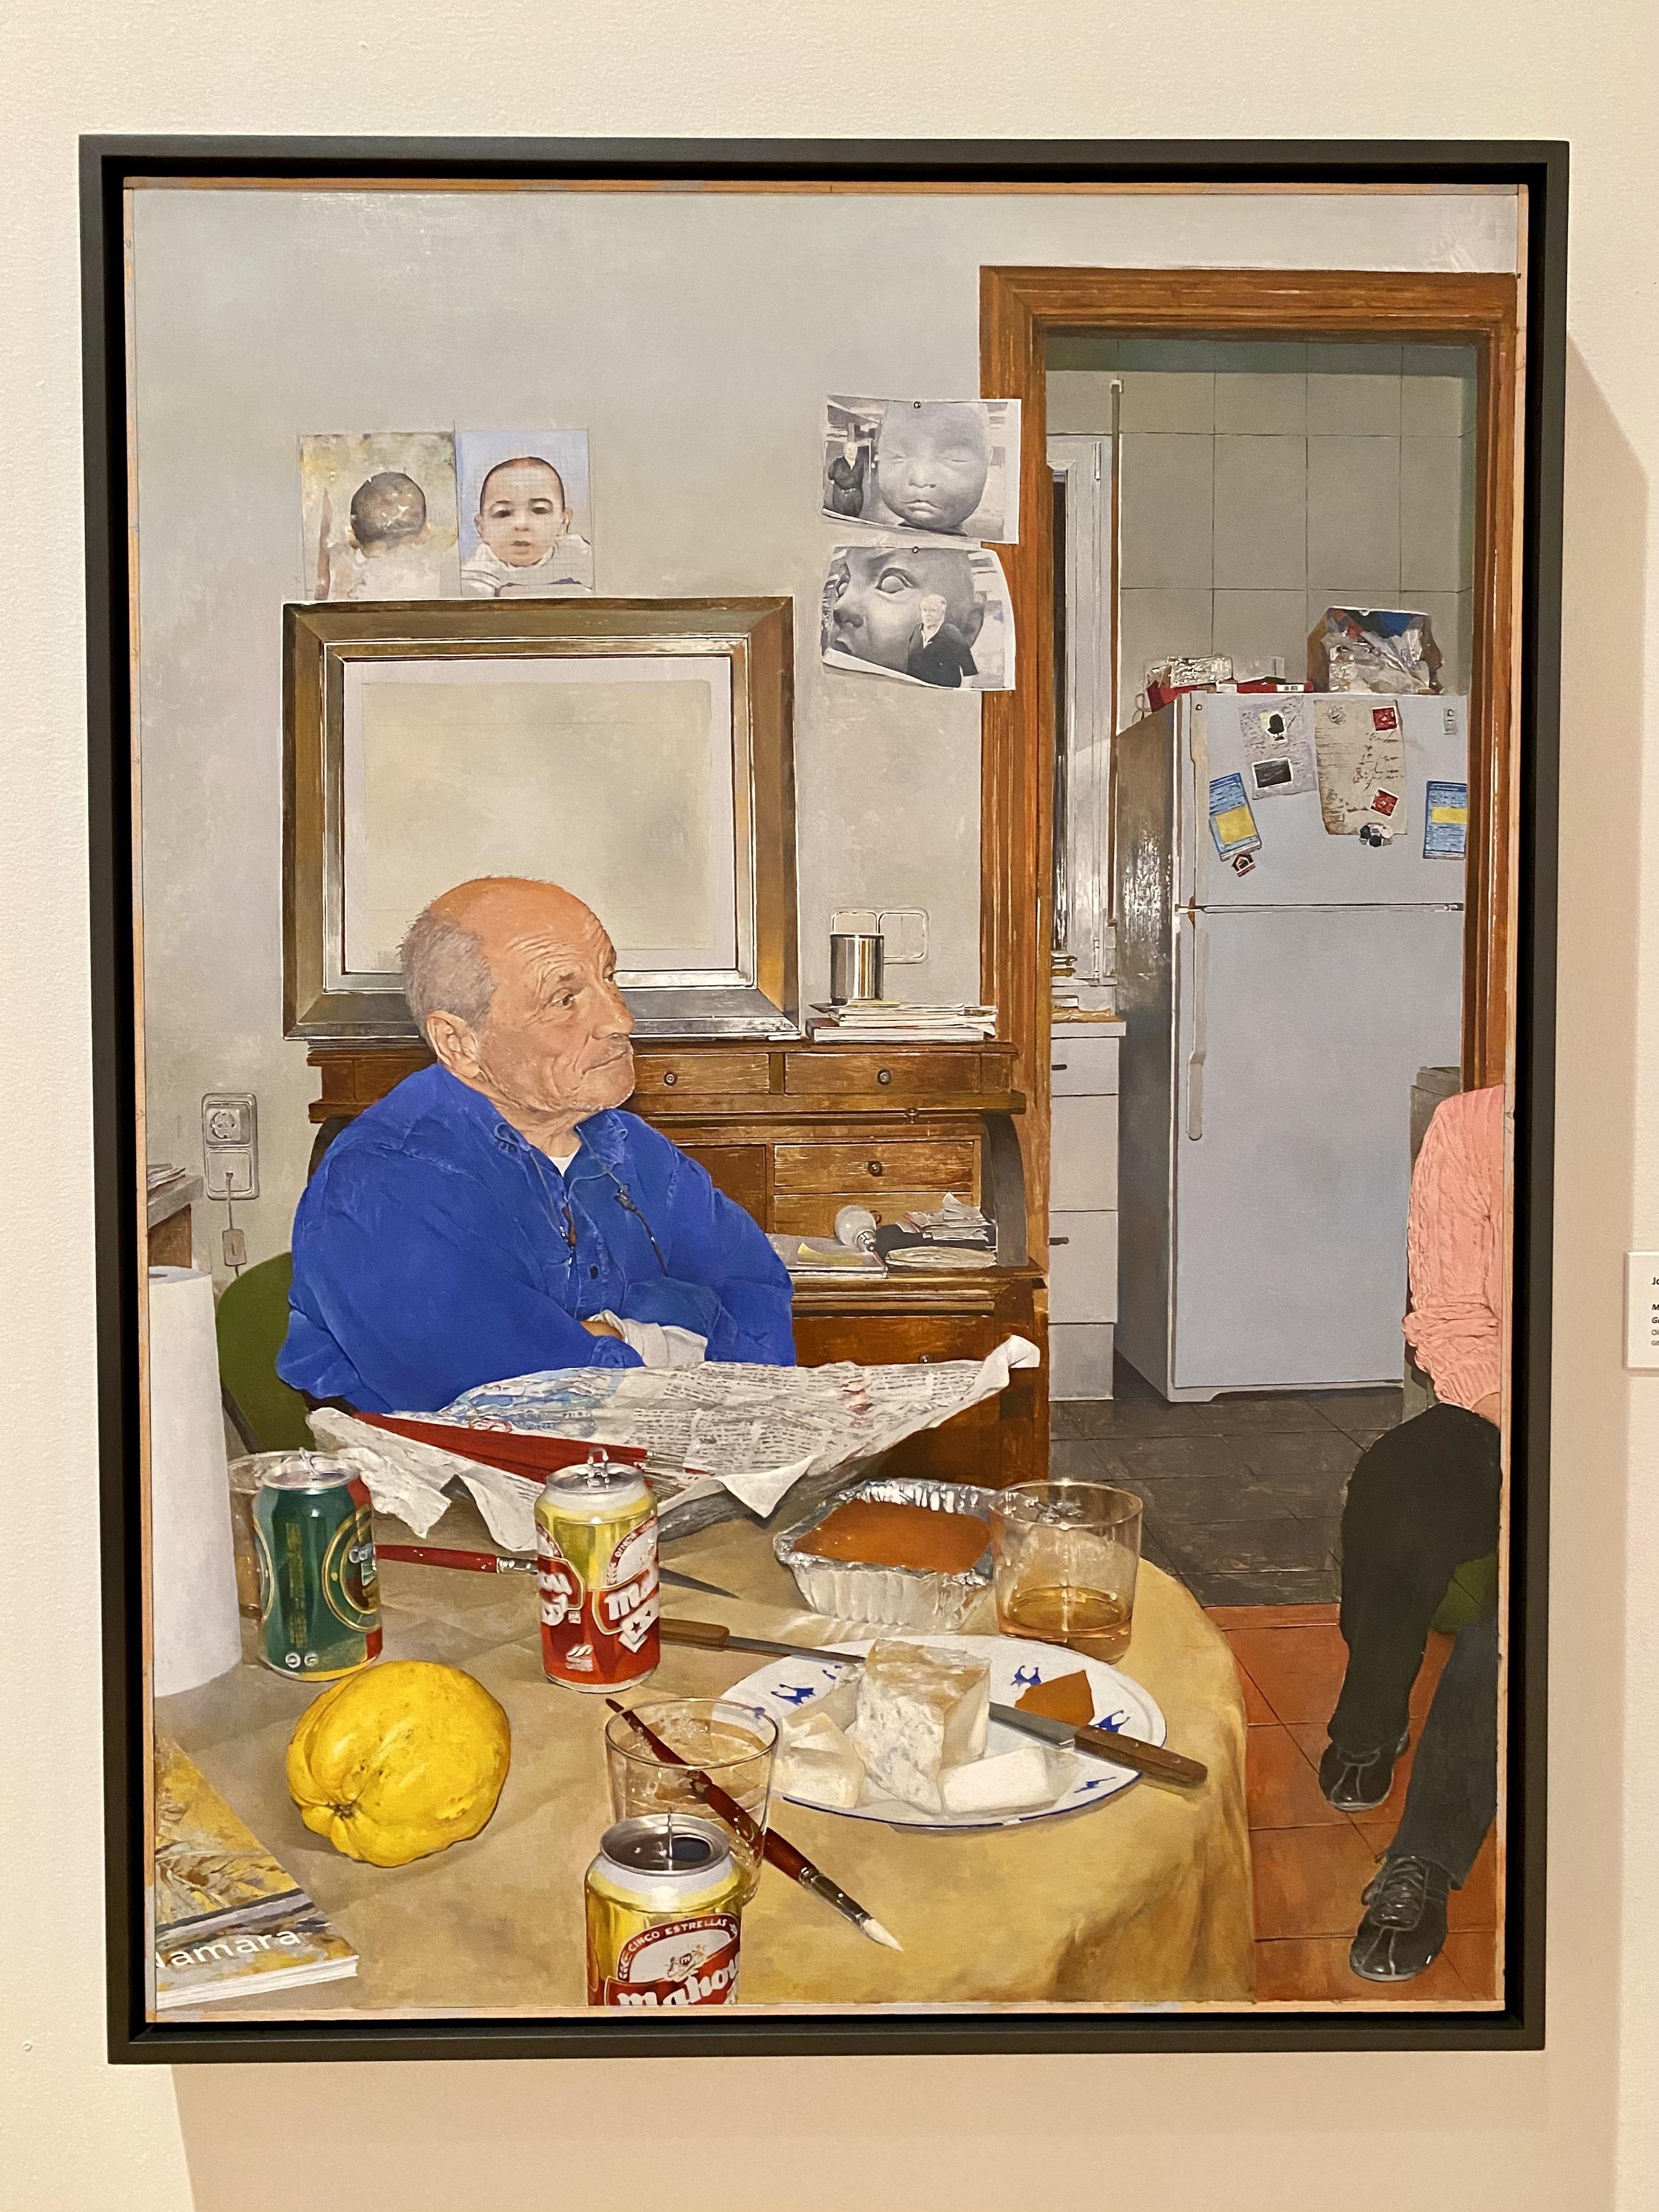 Joseph McNamara, <i>Madrid Interior (Portrait of Antonio Lopez Garcia)</i>, 2015, Oil on board, Gift of Gail and Arnst von Metzsch